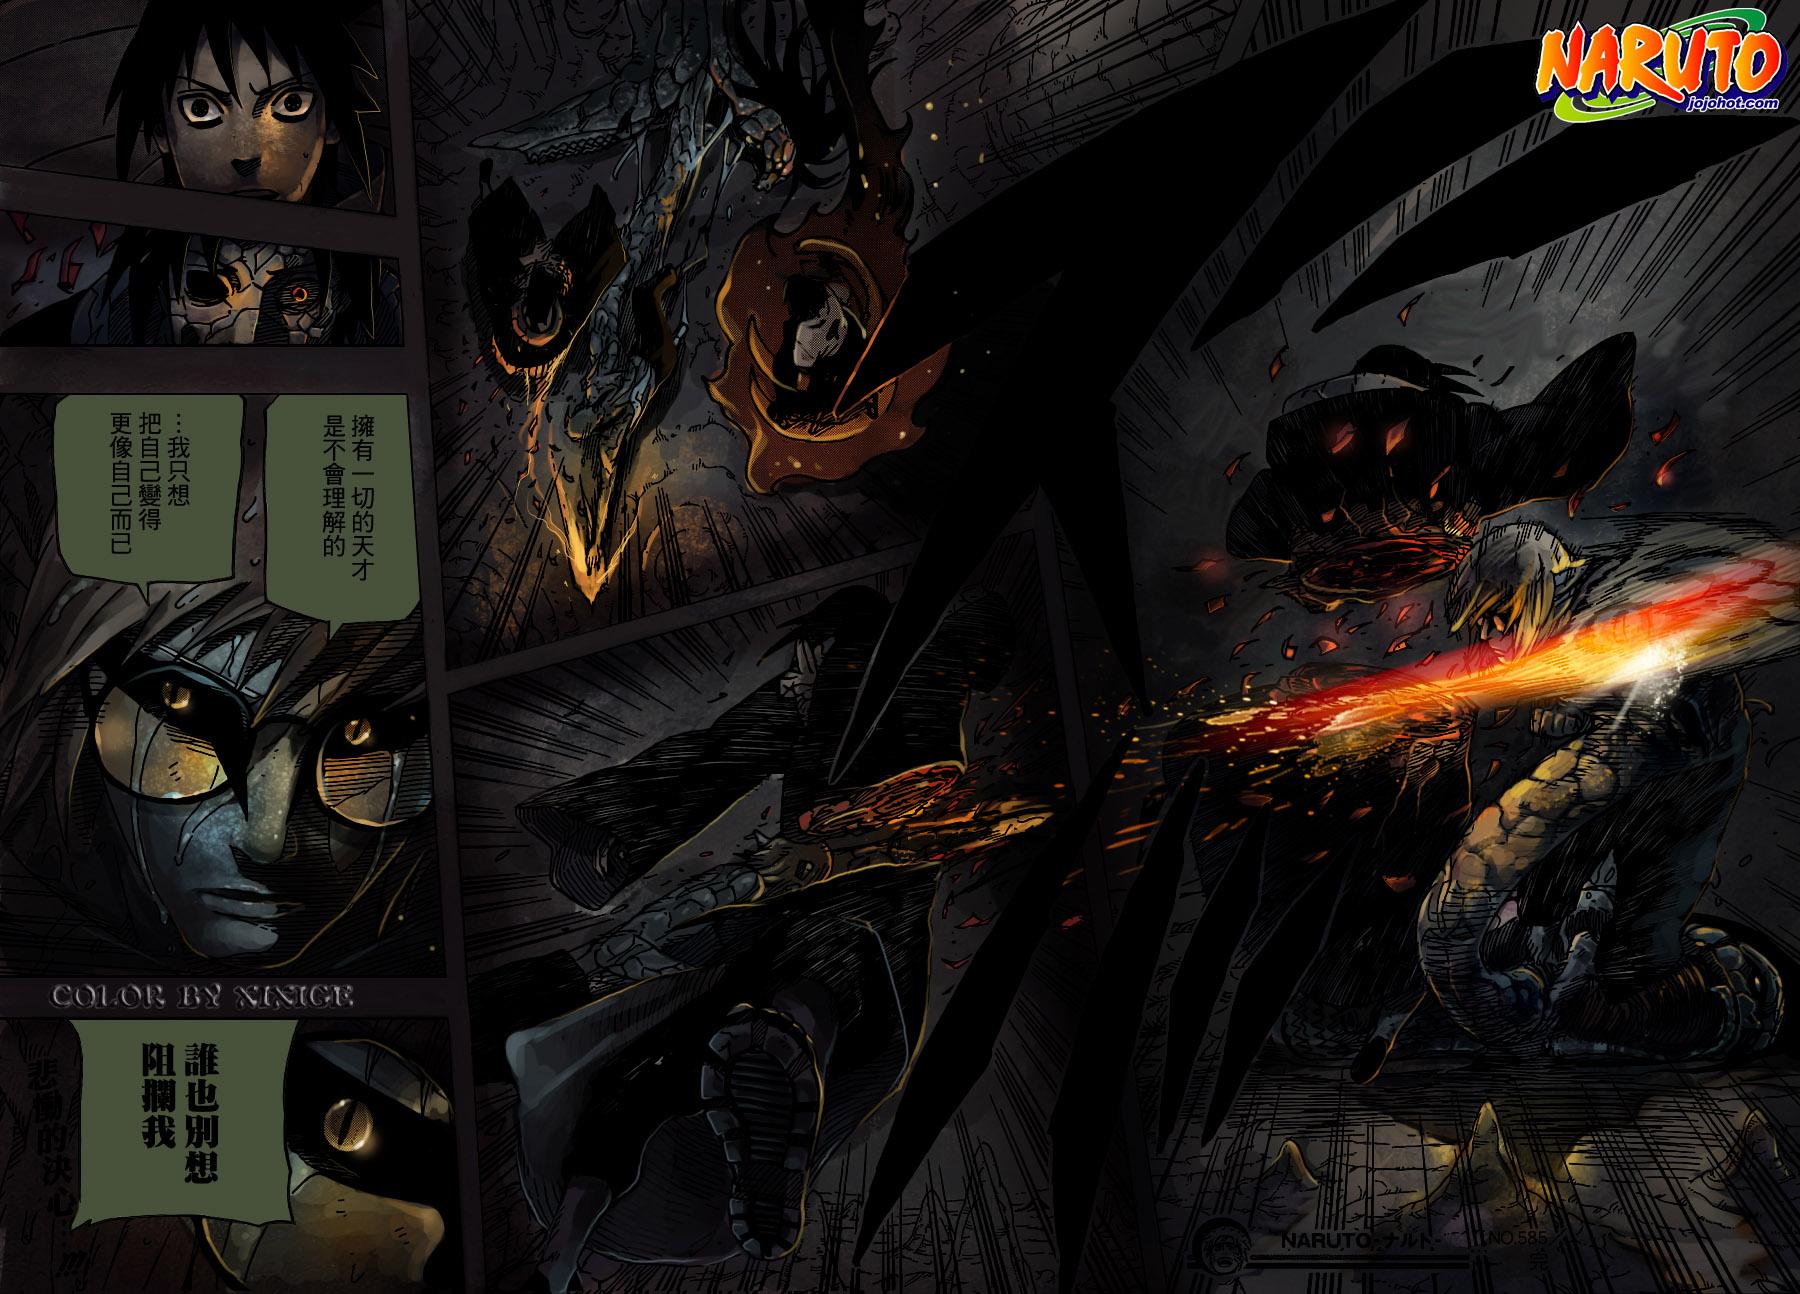 Naruto chap 587 Trang 22 - Mangak.info